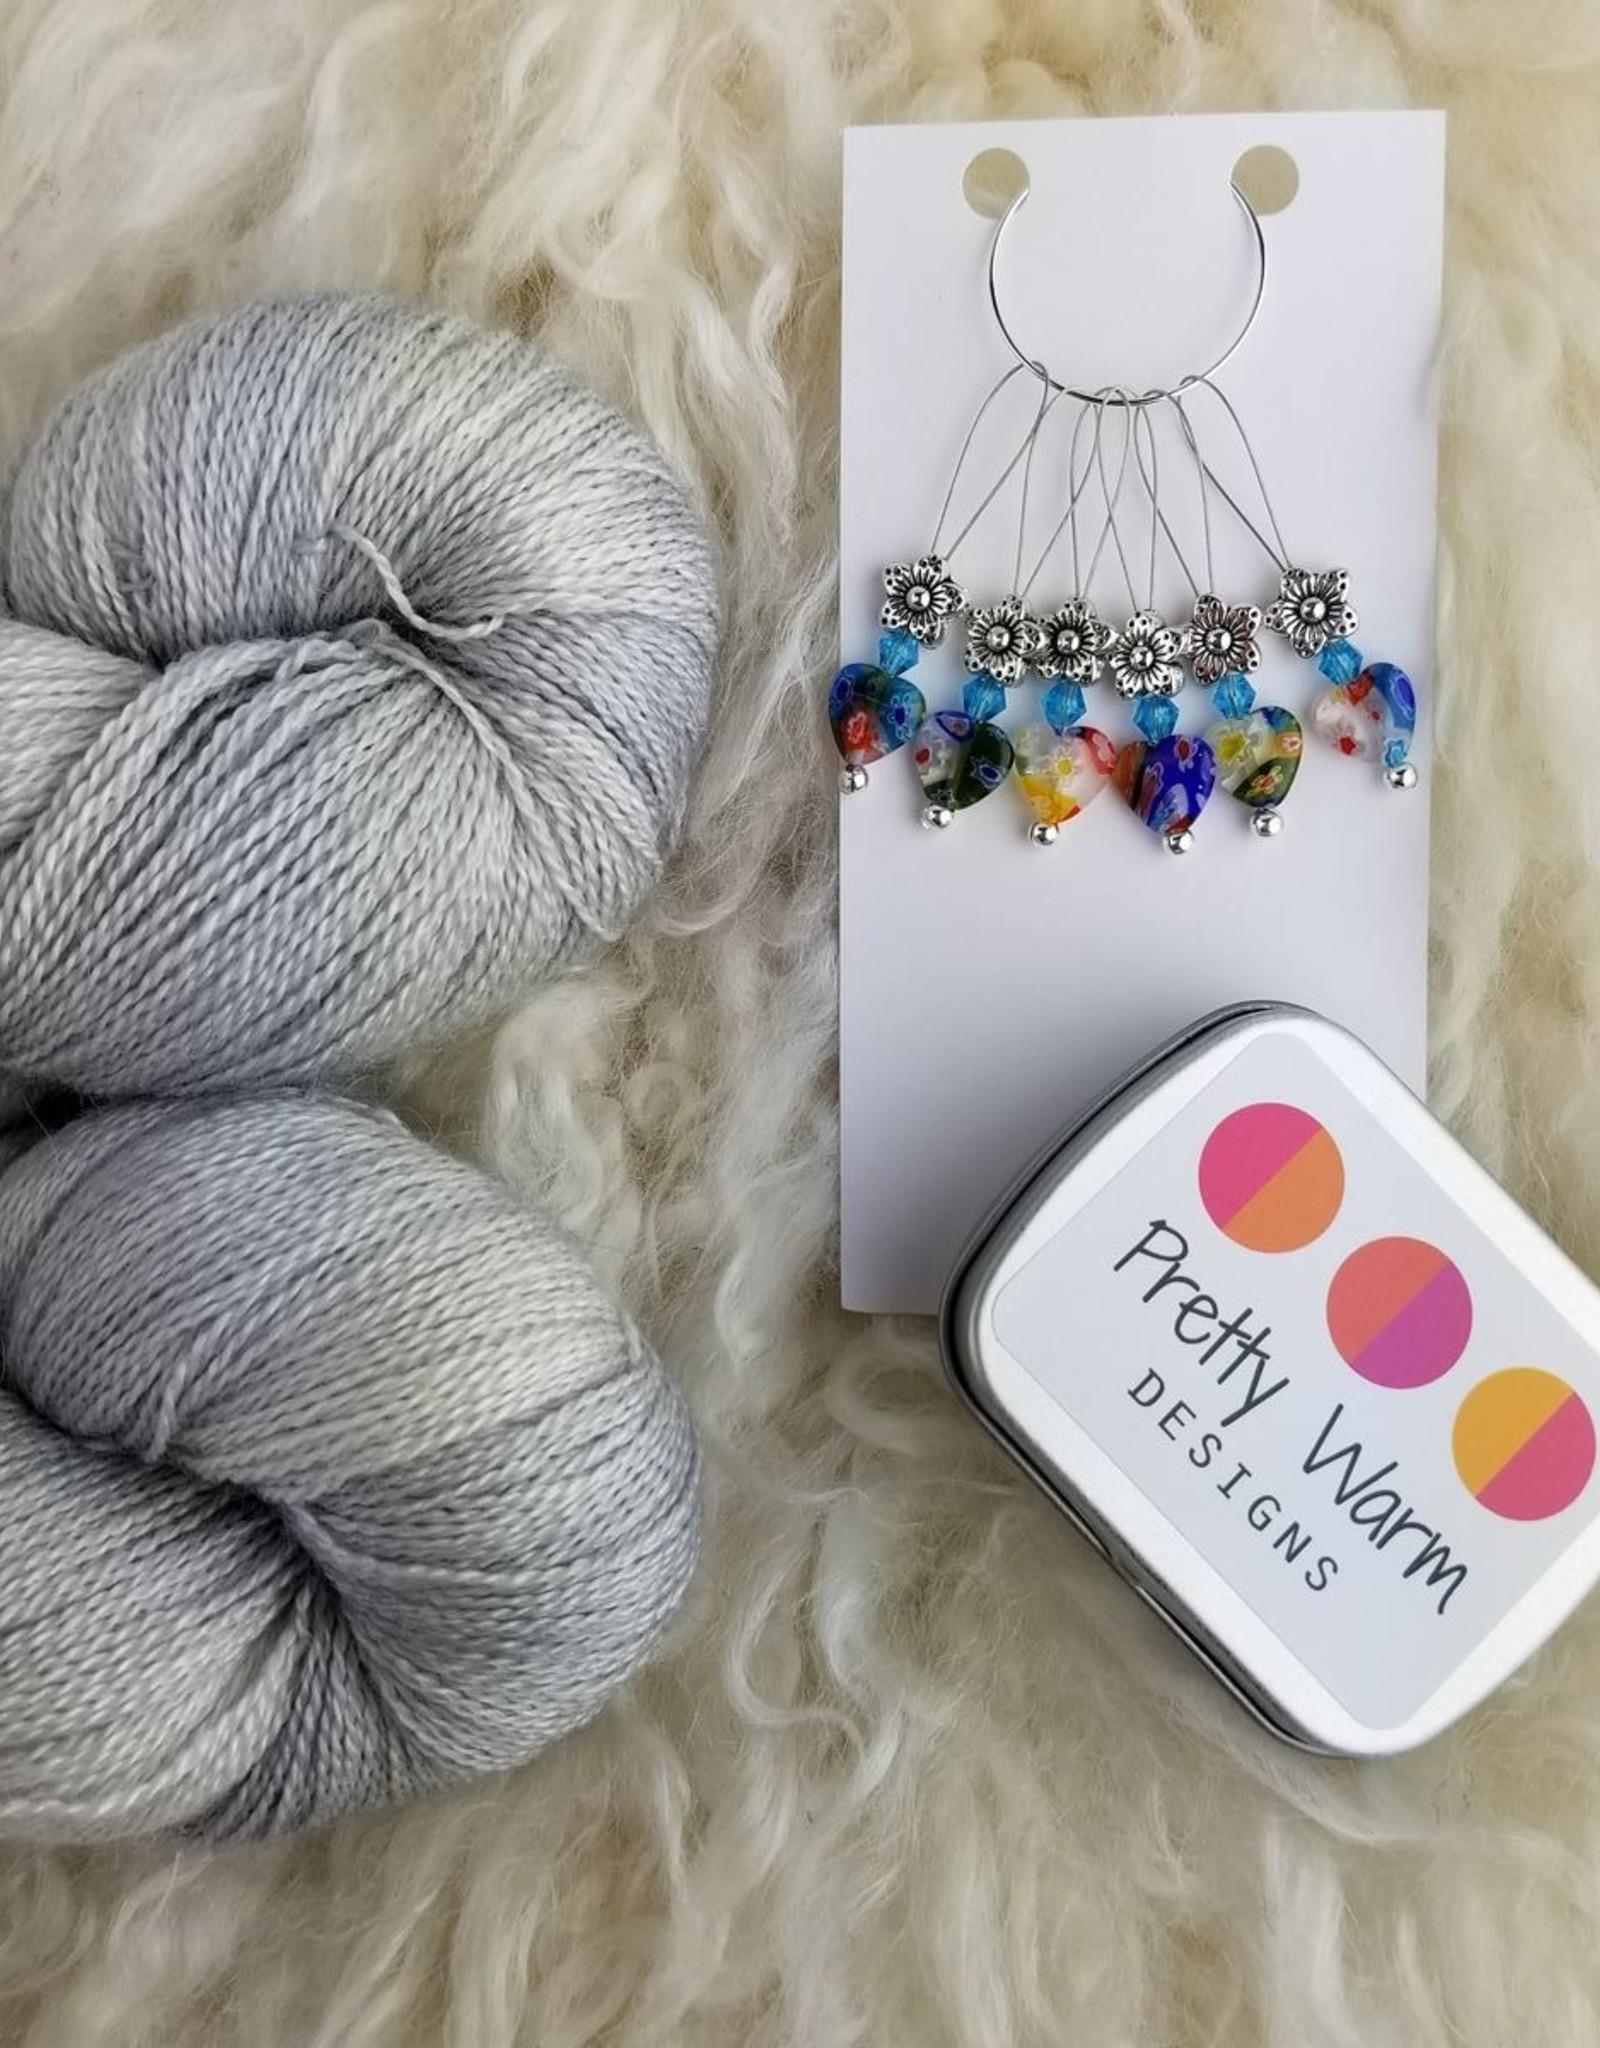 Palouse Yarn Co Lace Set SilkyAL Airstream + Hearts